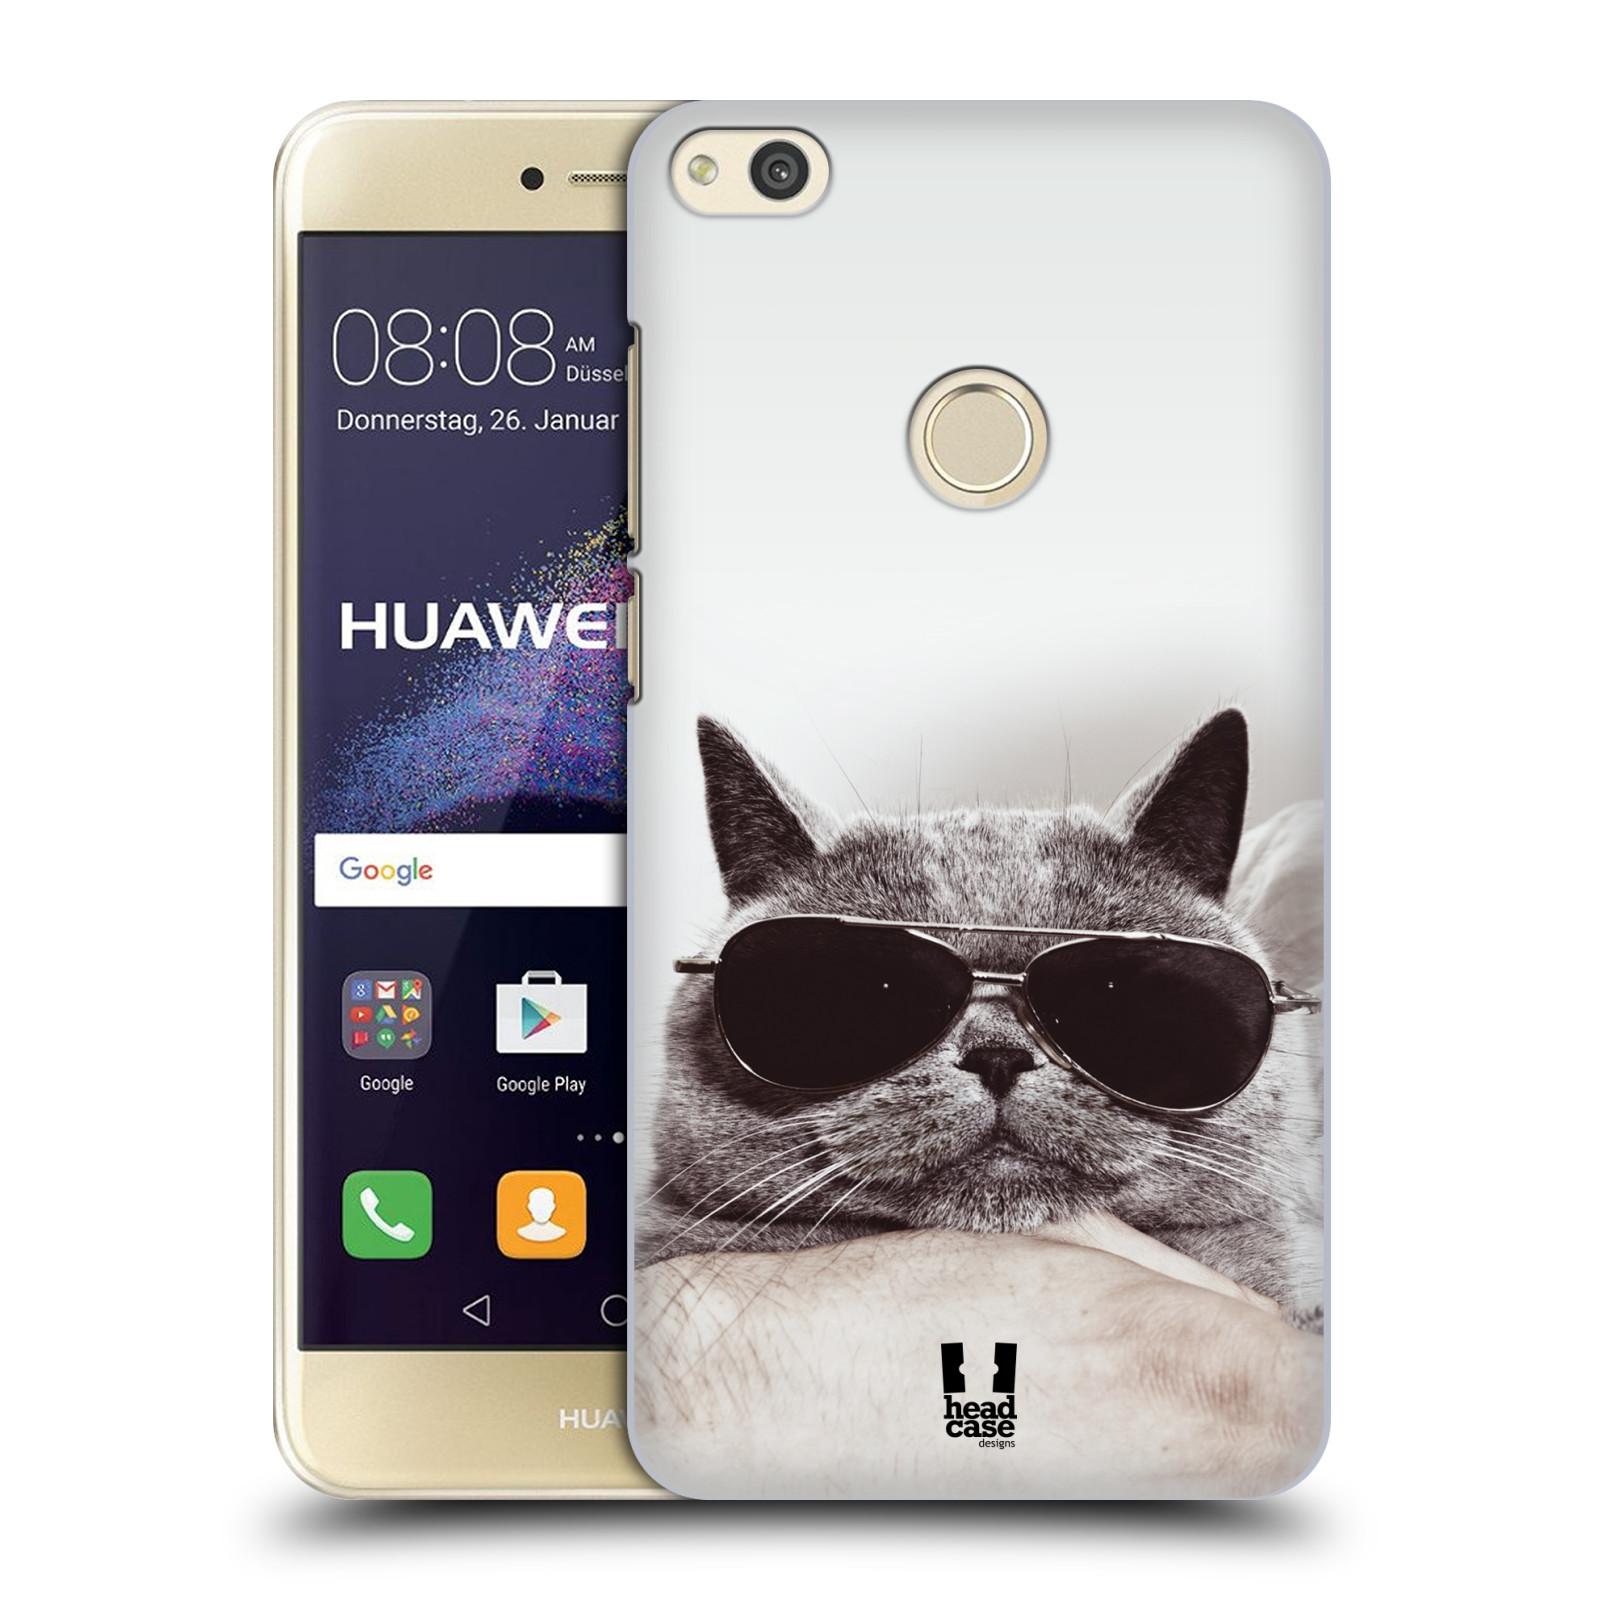 Plastové pouzdro na mobil Huawei P9 Lite (2017) - Head Case KOTĚ S BRÝLEMI